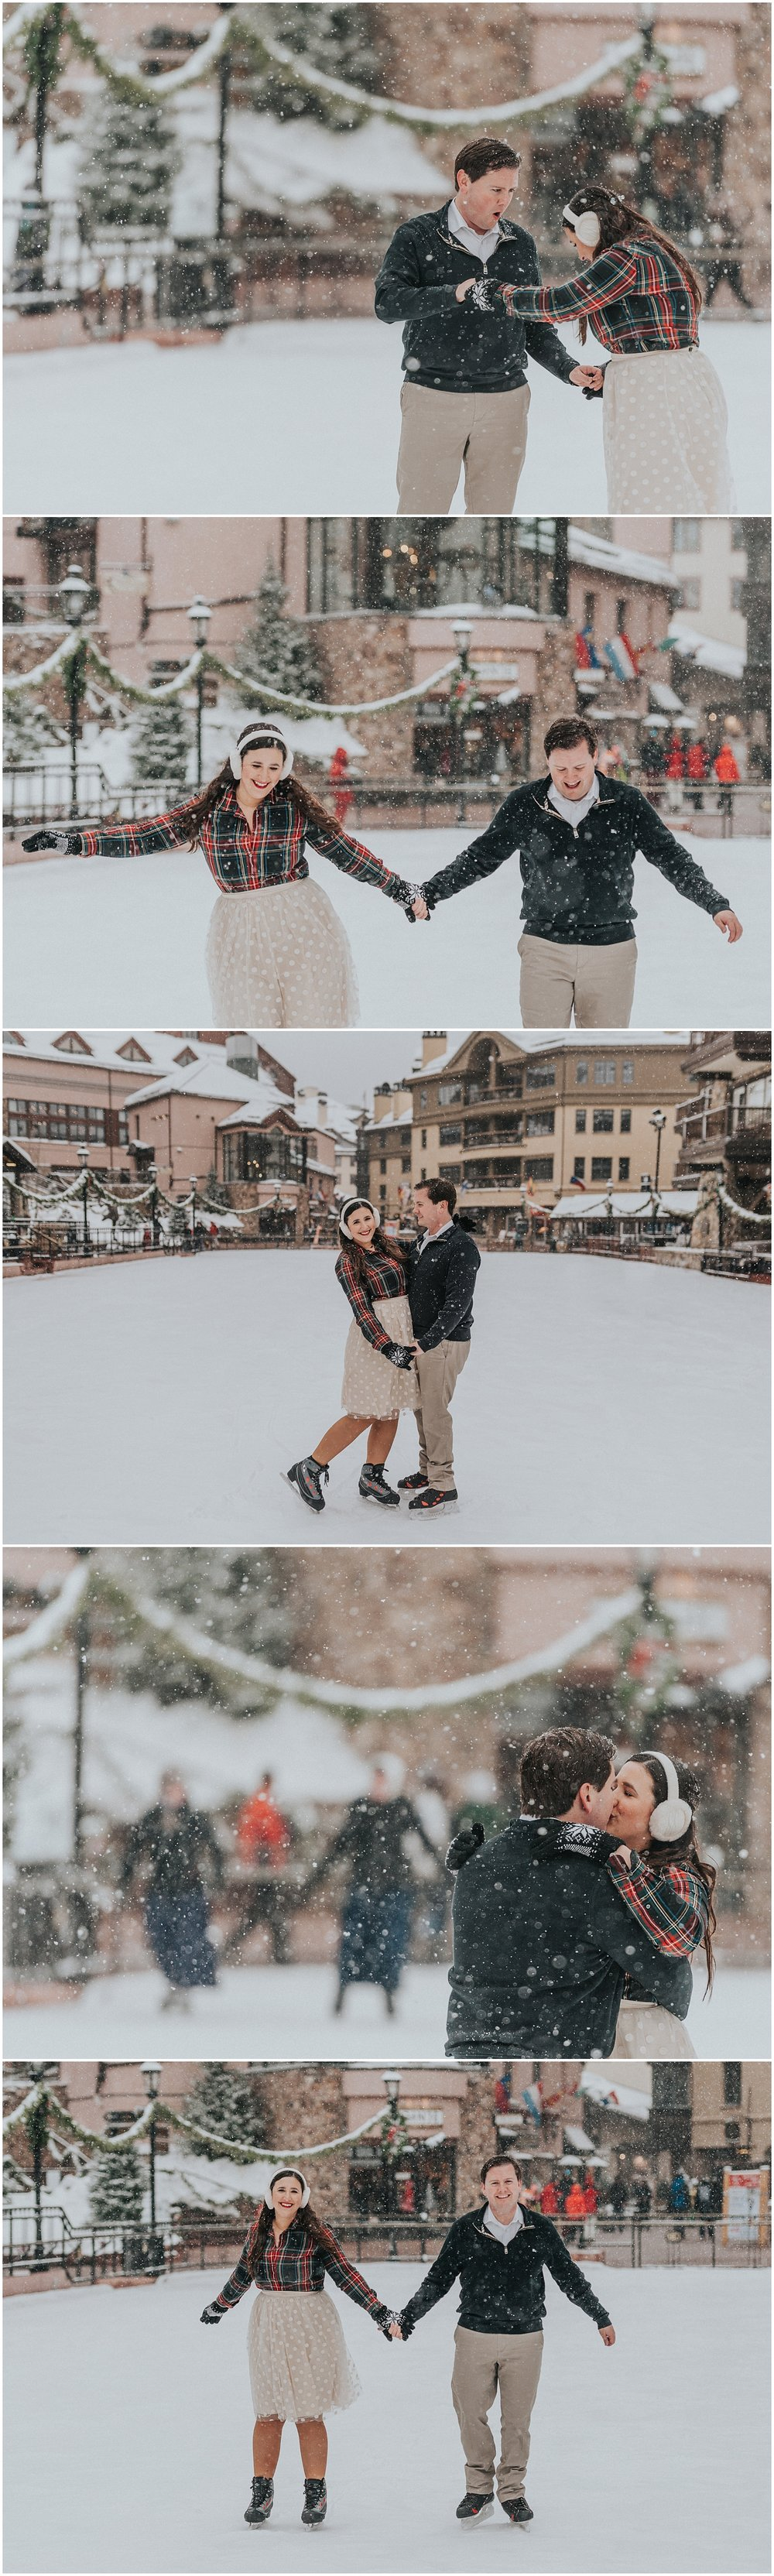 beavercreek_colorado_winter_engagement_photos_0017.jpg